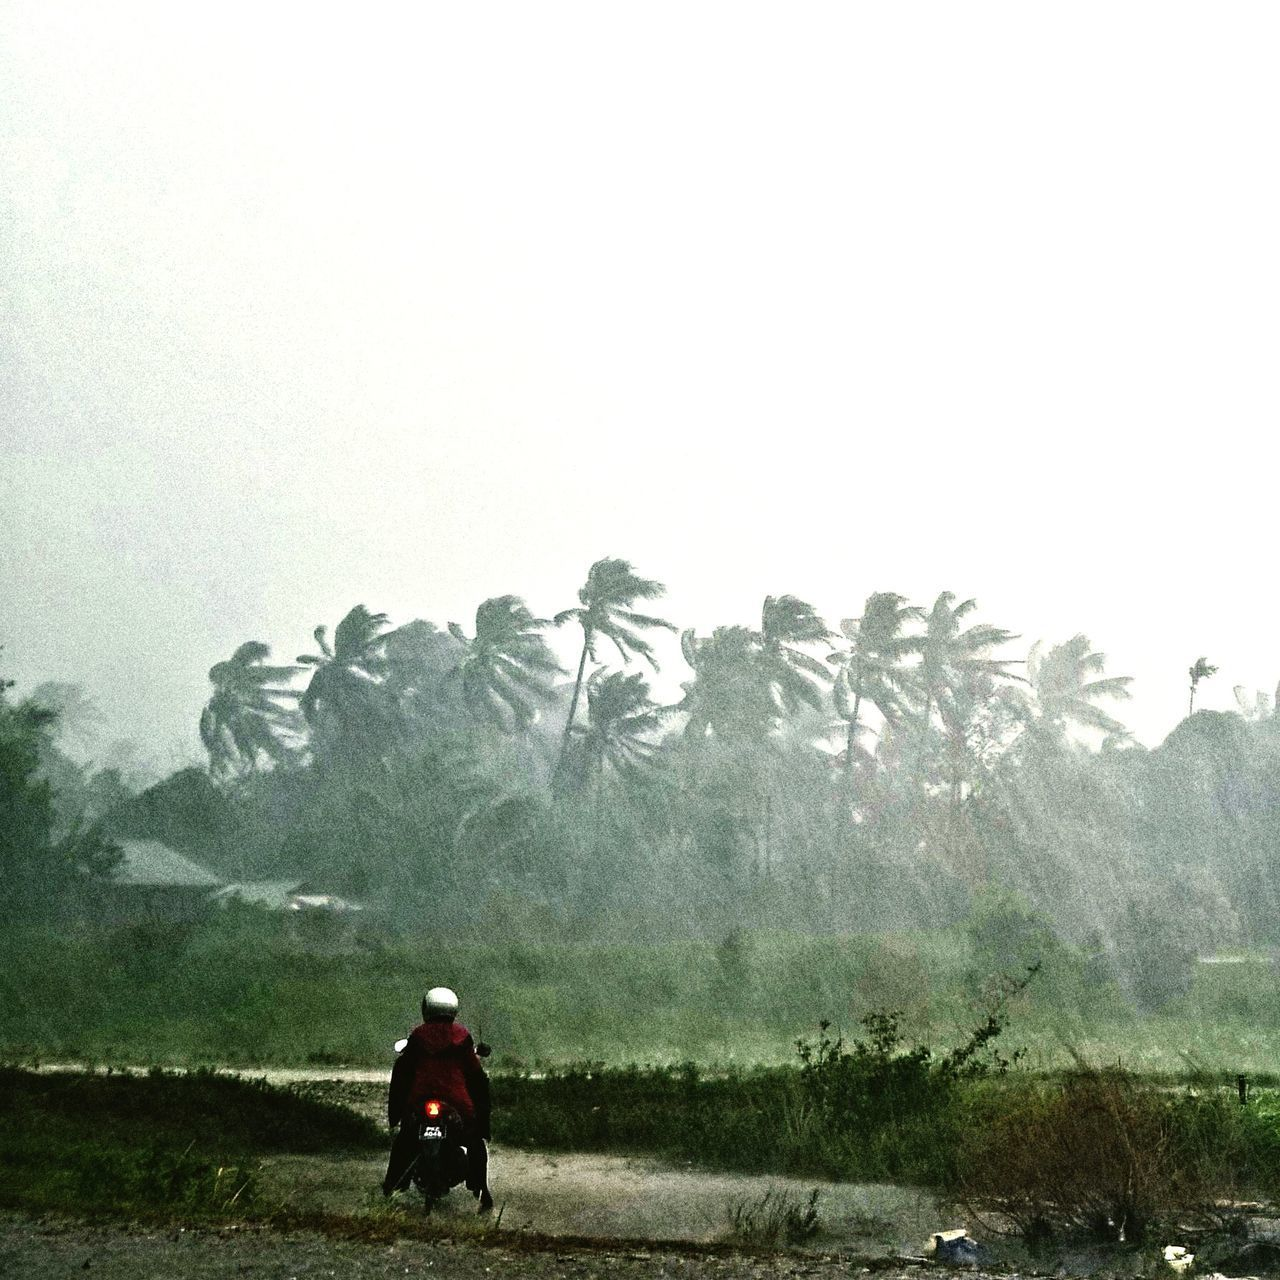 Weather Real People Outdoors Women Raining Day Raining Motorbike